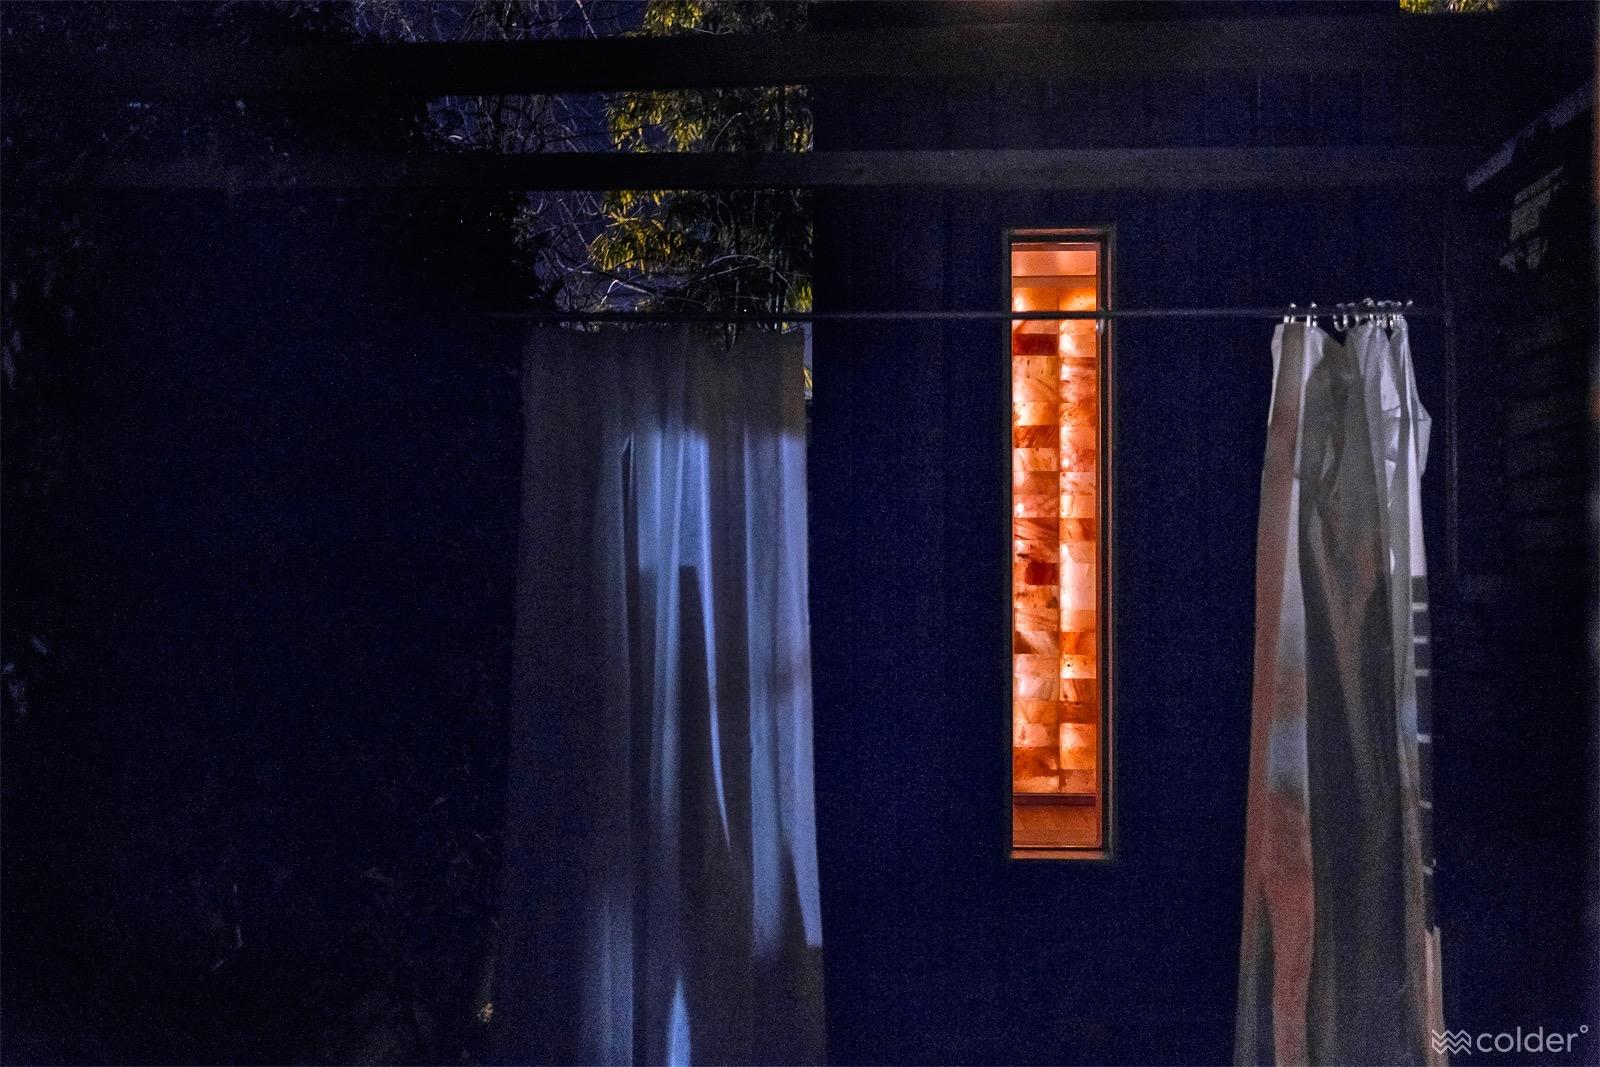 Circle Wellness Studios' WelPod at night with Himilayan Salt walls seen through window